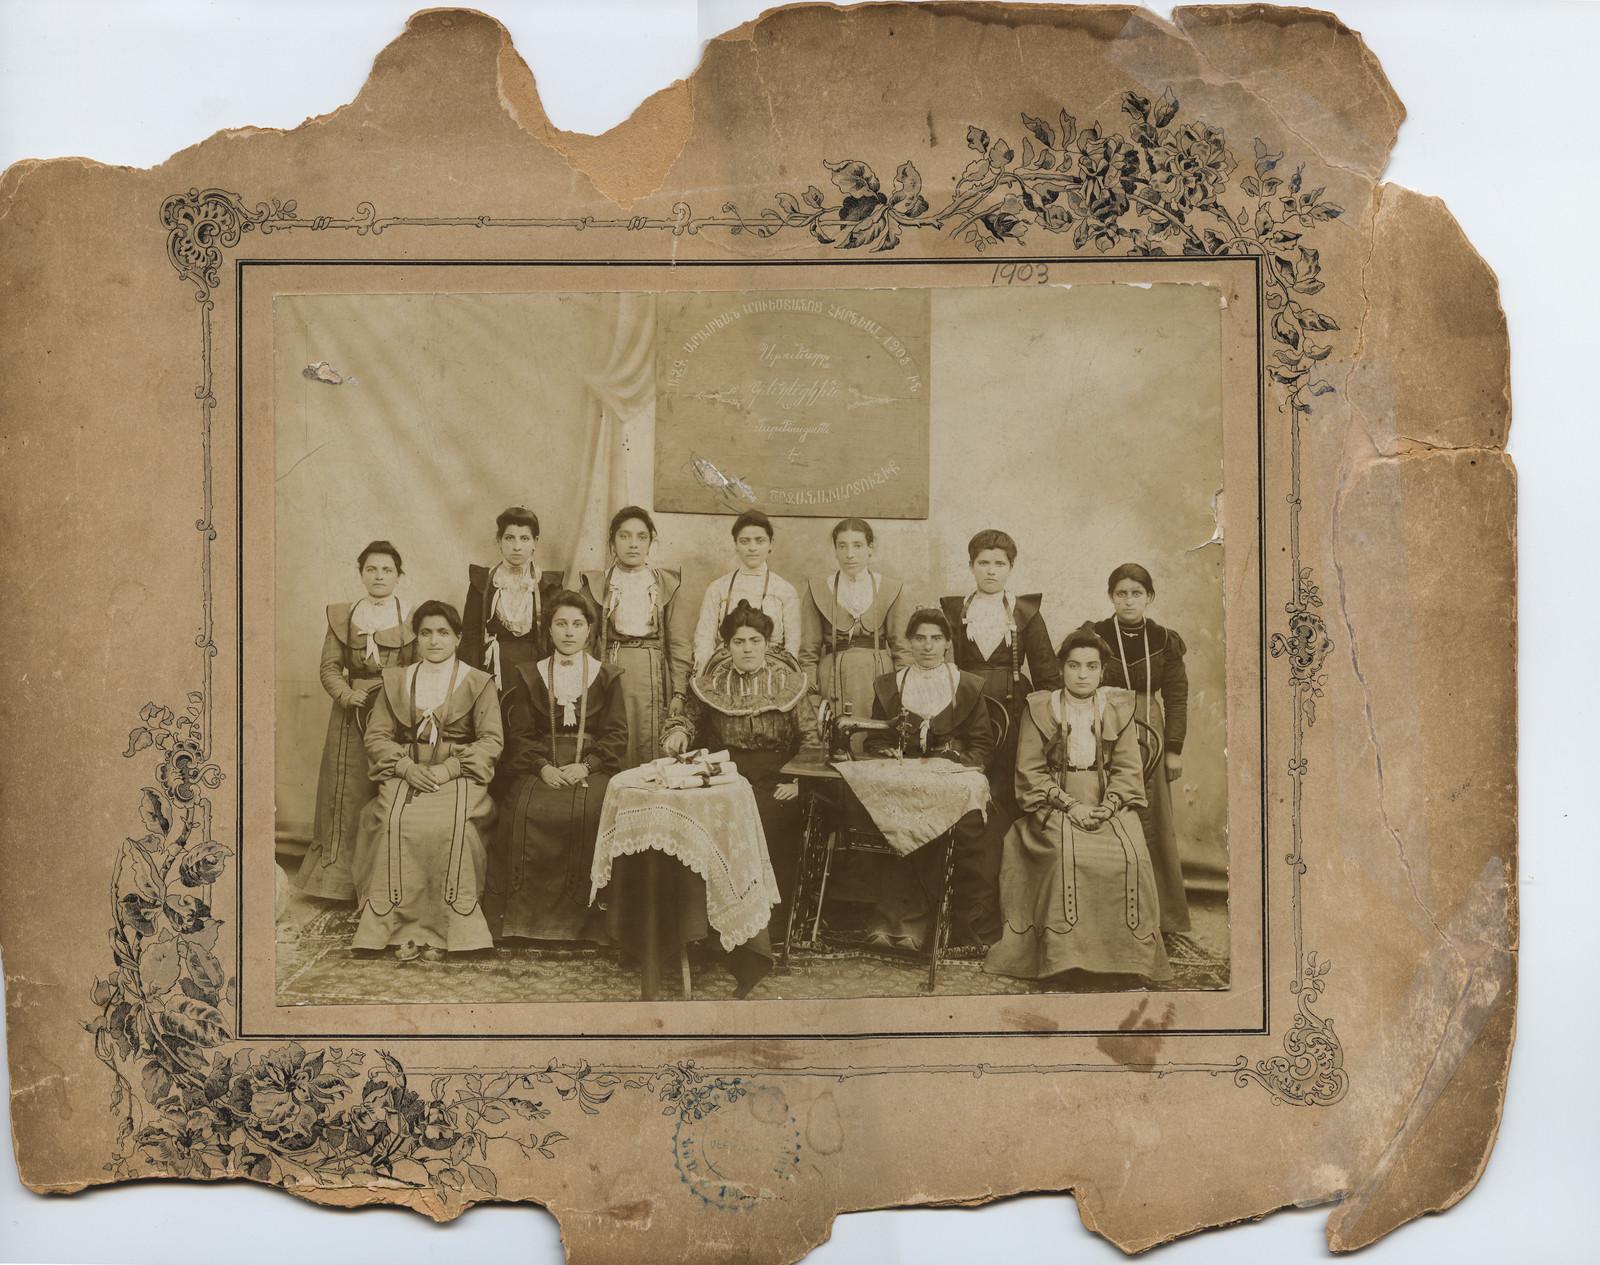 Seamstress Class Graduation, National Aramian Trade School (founded 1903), Sepastia, Ottoman Empire, c. 1908; photographer unknown.